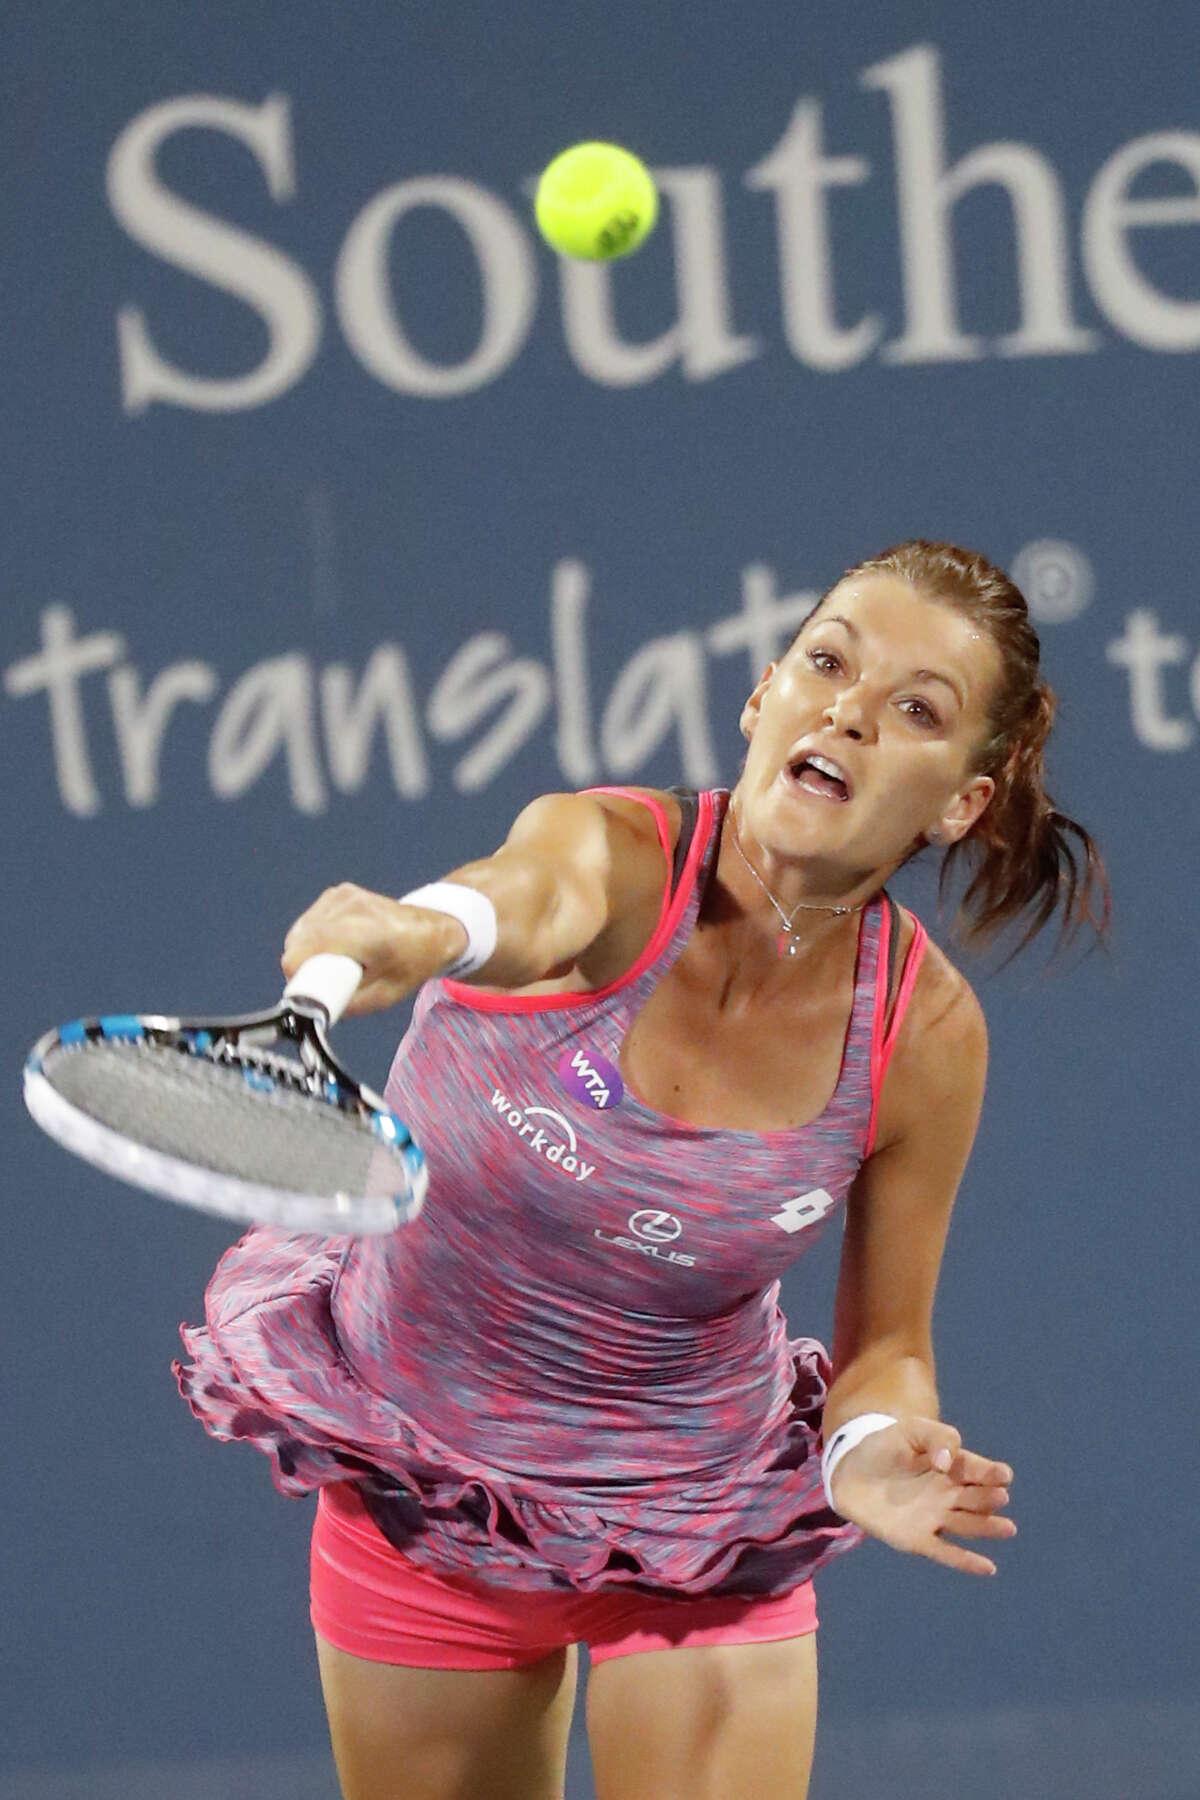 Agnieszka Radwanska, of Poland earned a wildcard into the Connecticut Open.